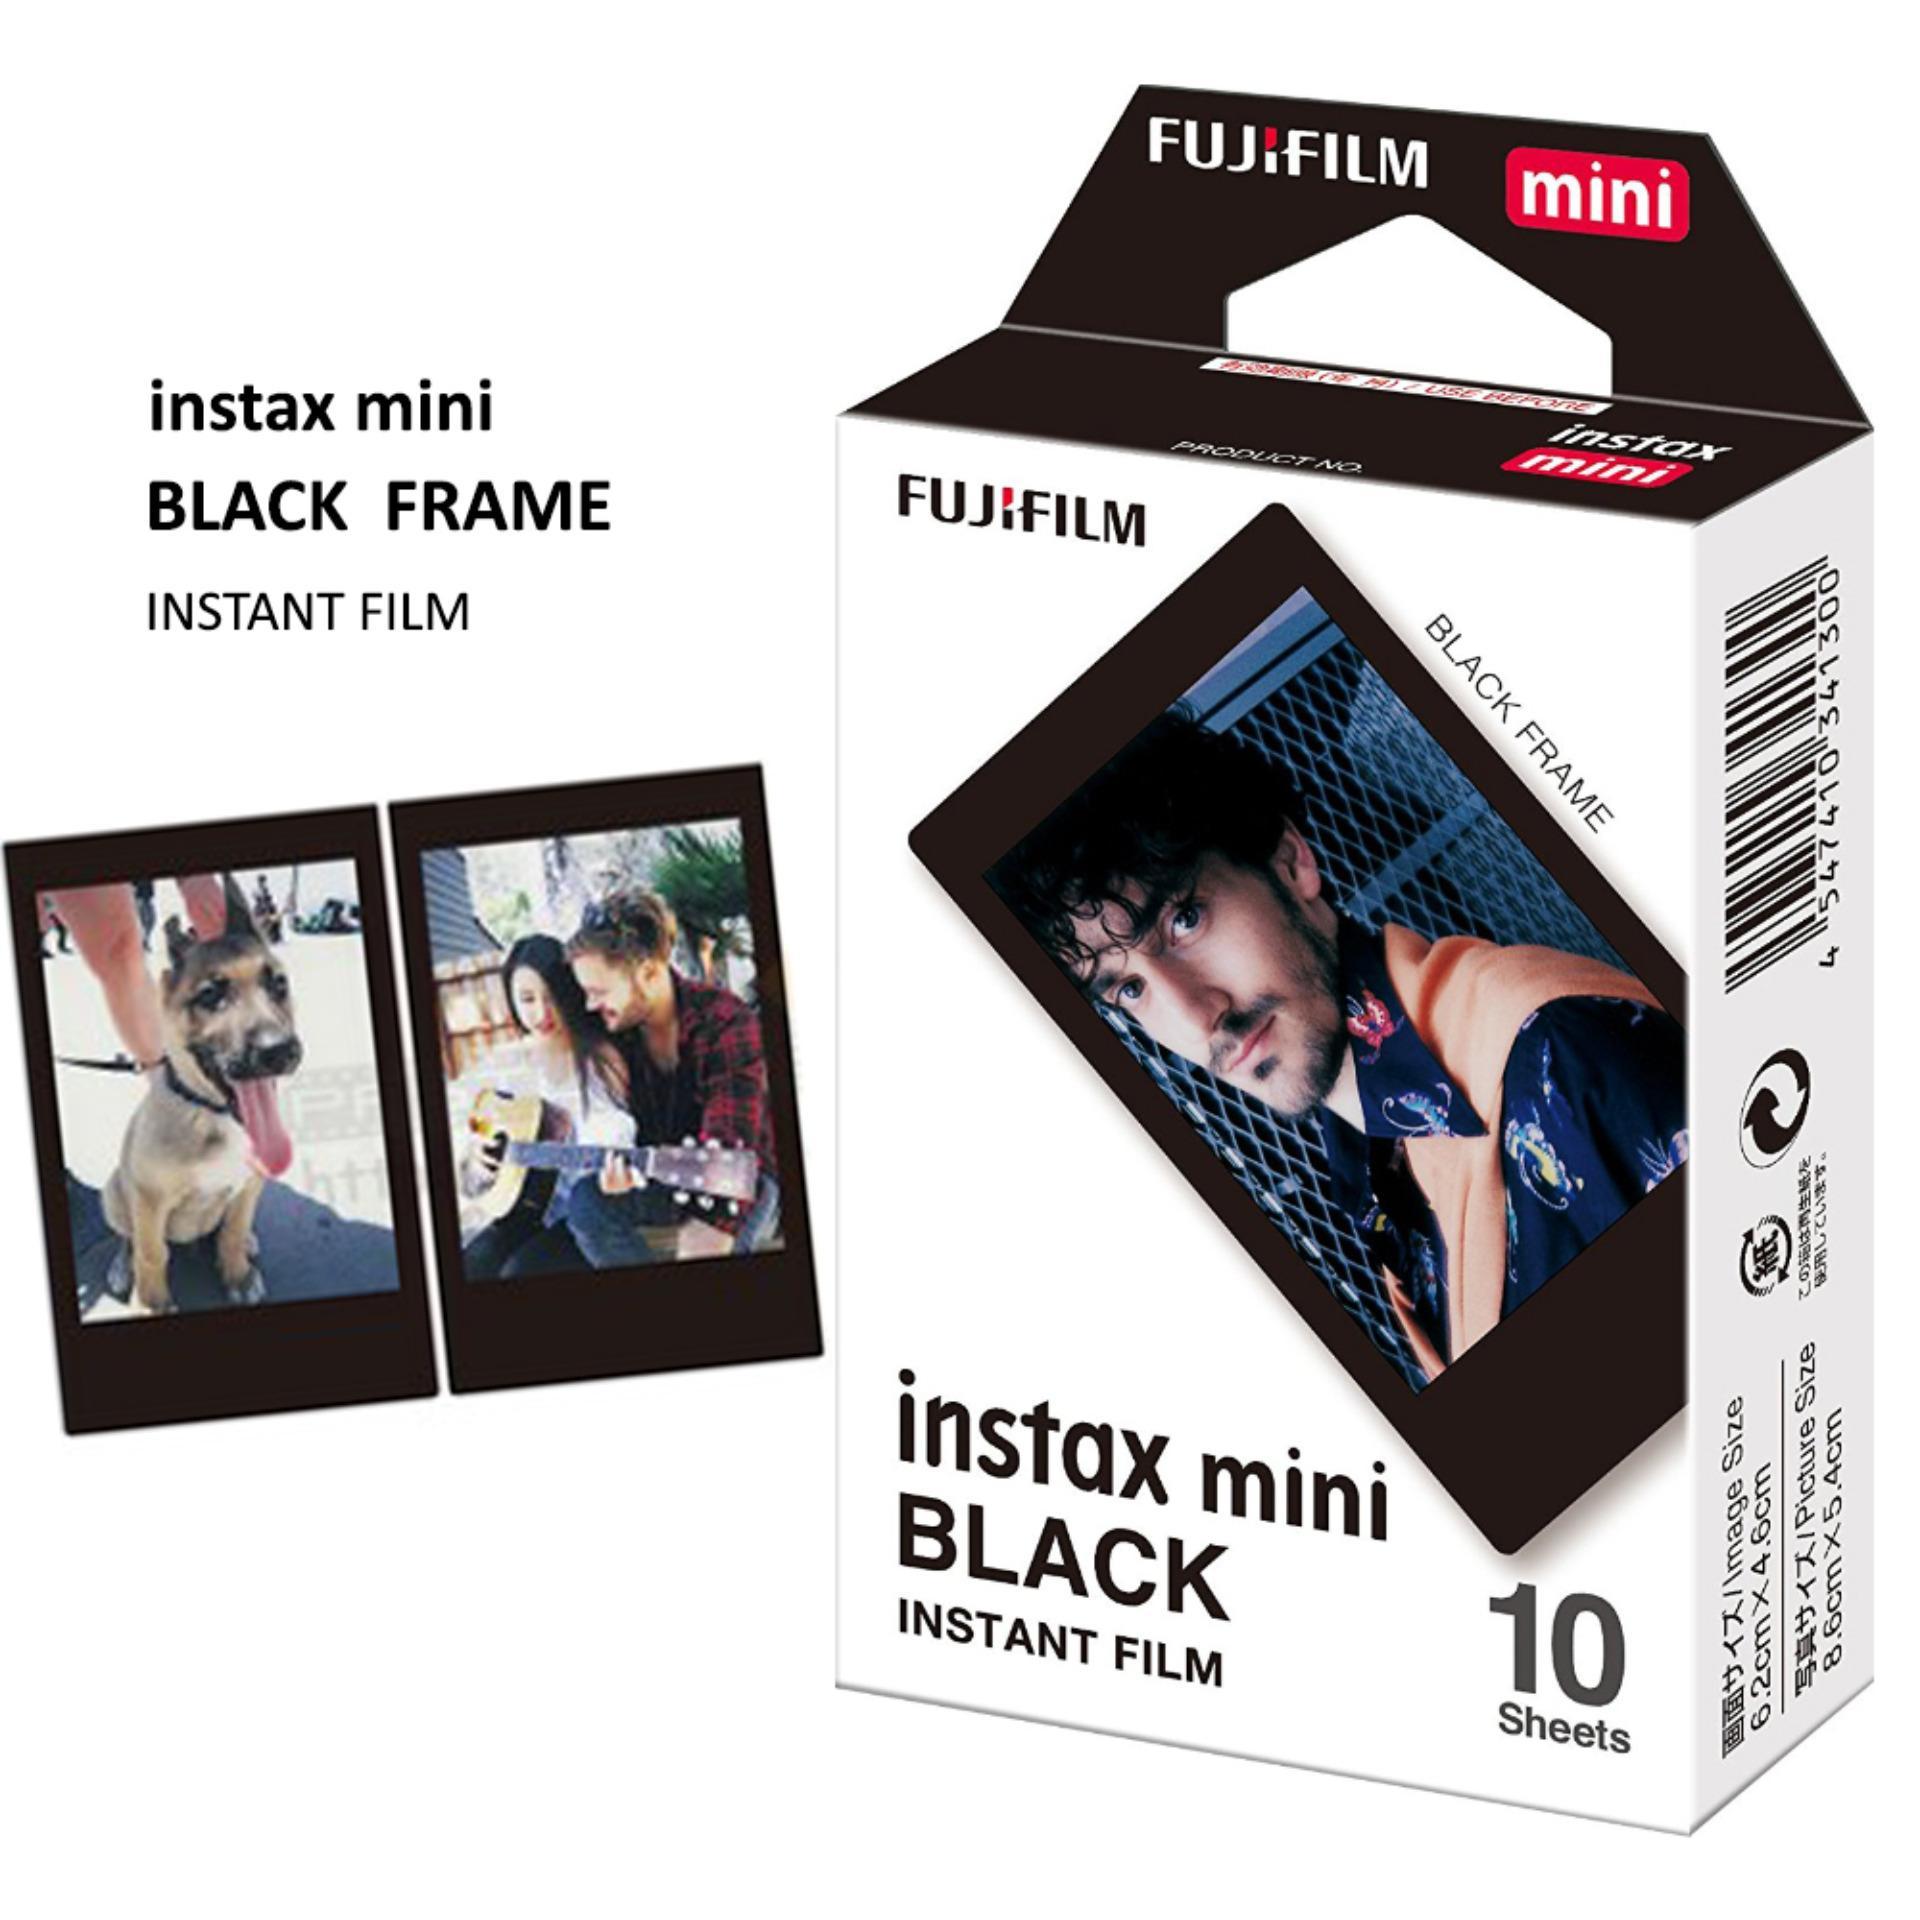 Fujifilm Refill Instax Mini Black Frame Film - Hitam